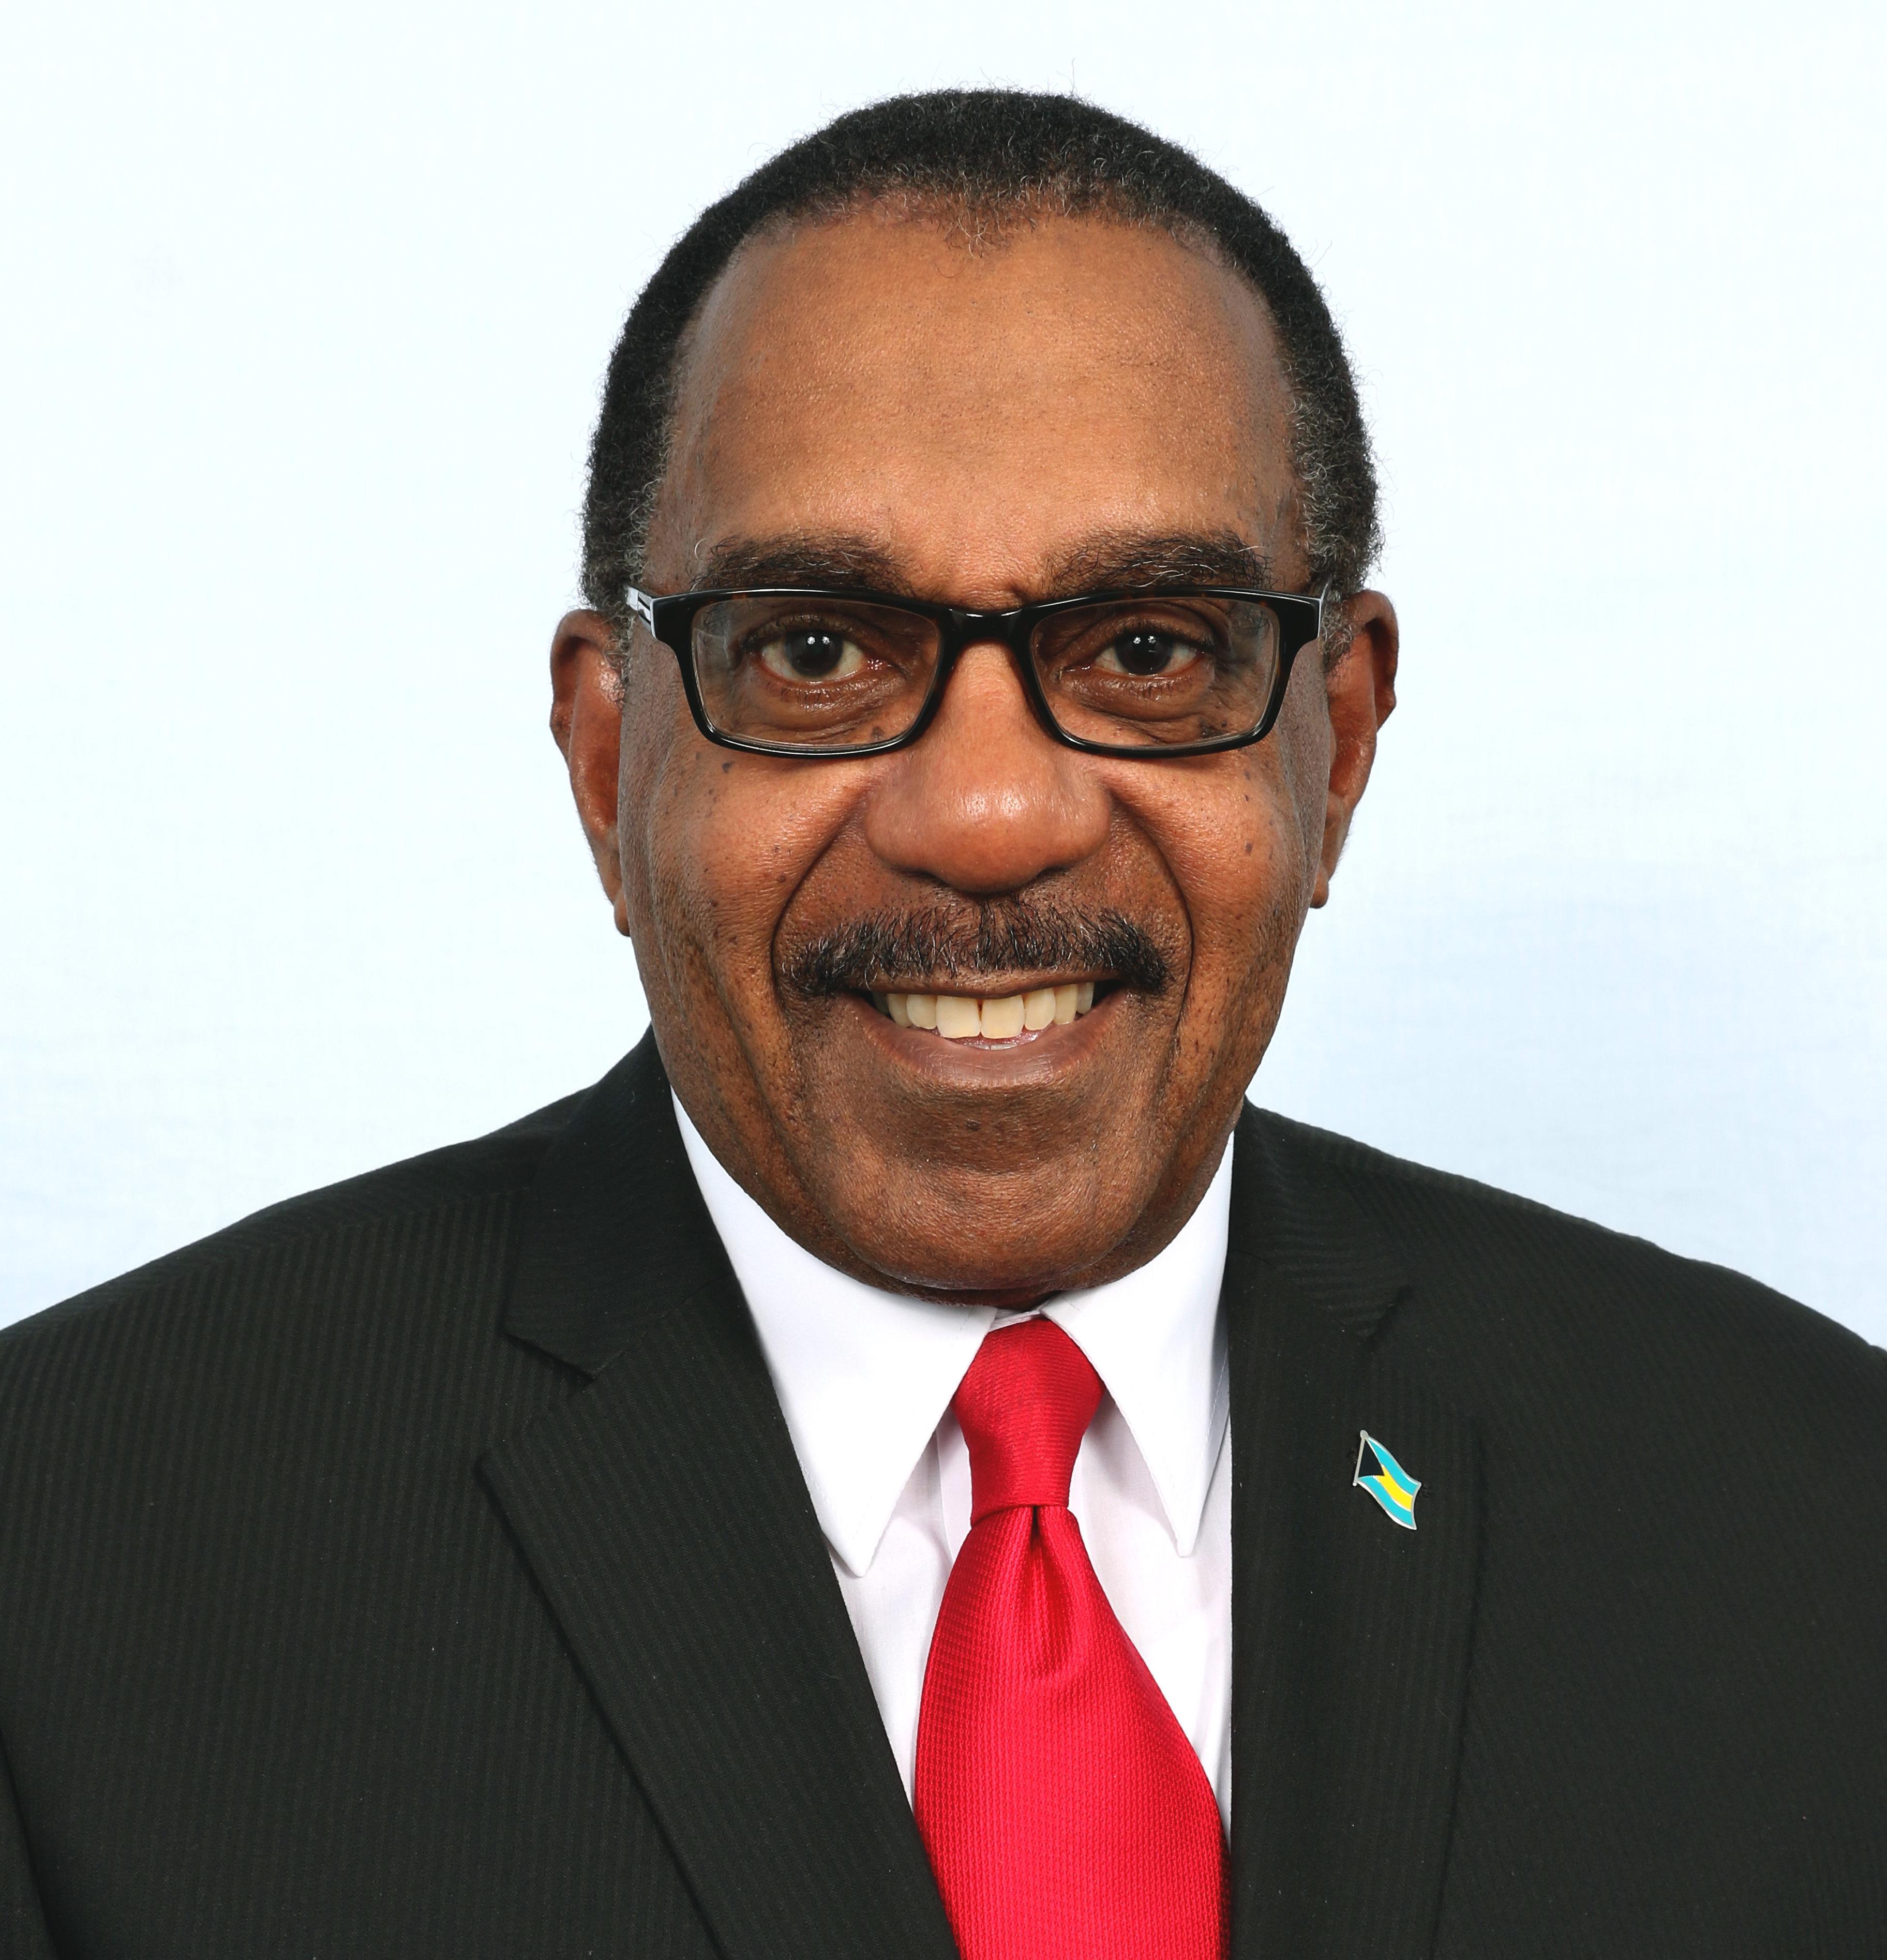 Desmond Edwards serves as Ambassador to UNESCO